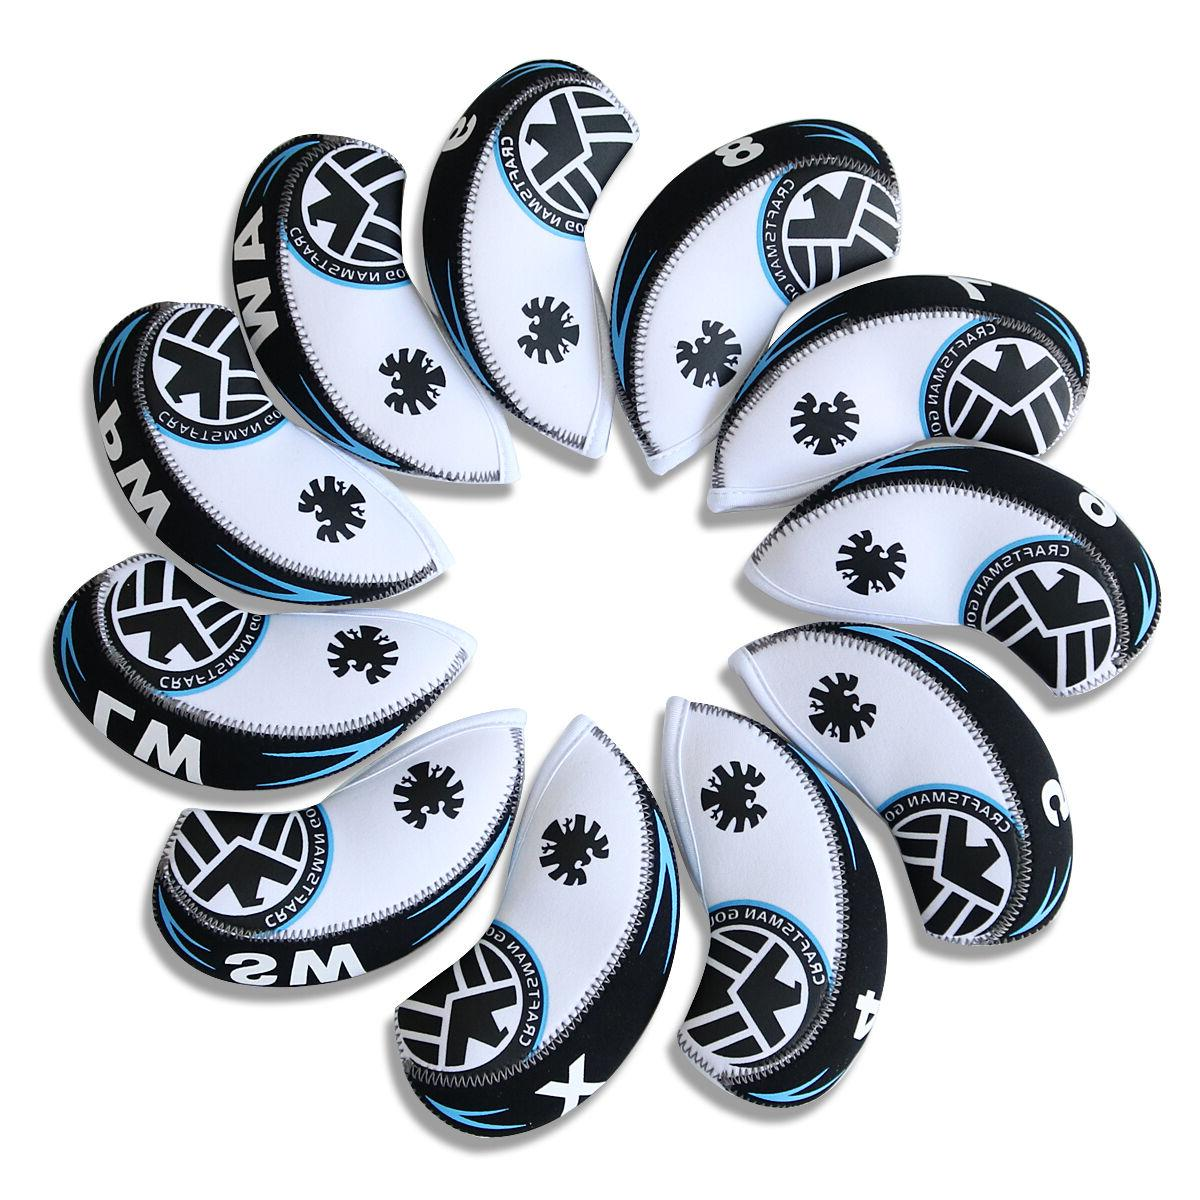 11pcs Golf Iron Head Covers For Cleveland Mizuno Callaway Ta